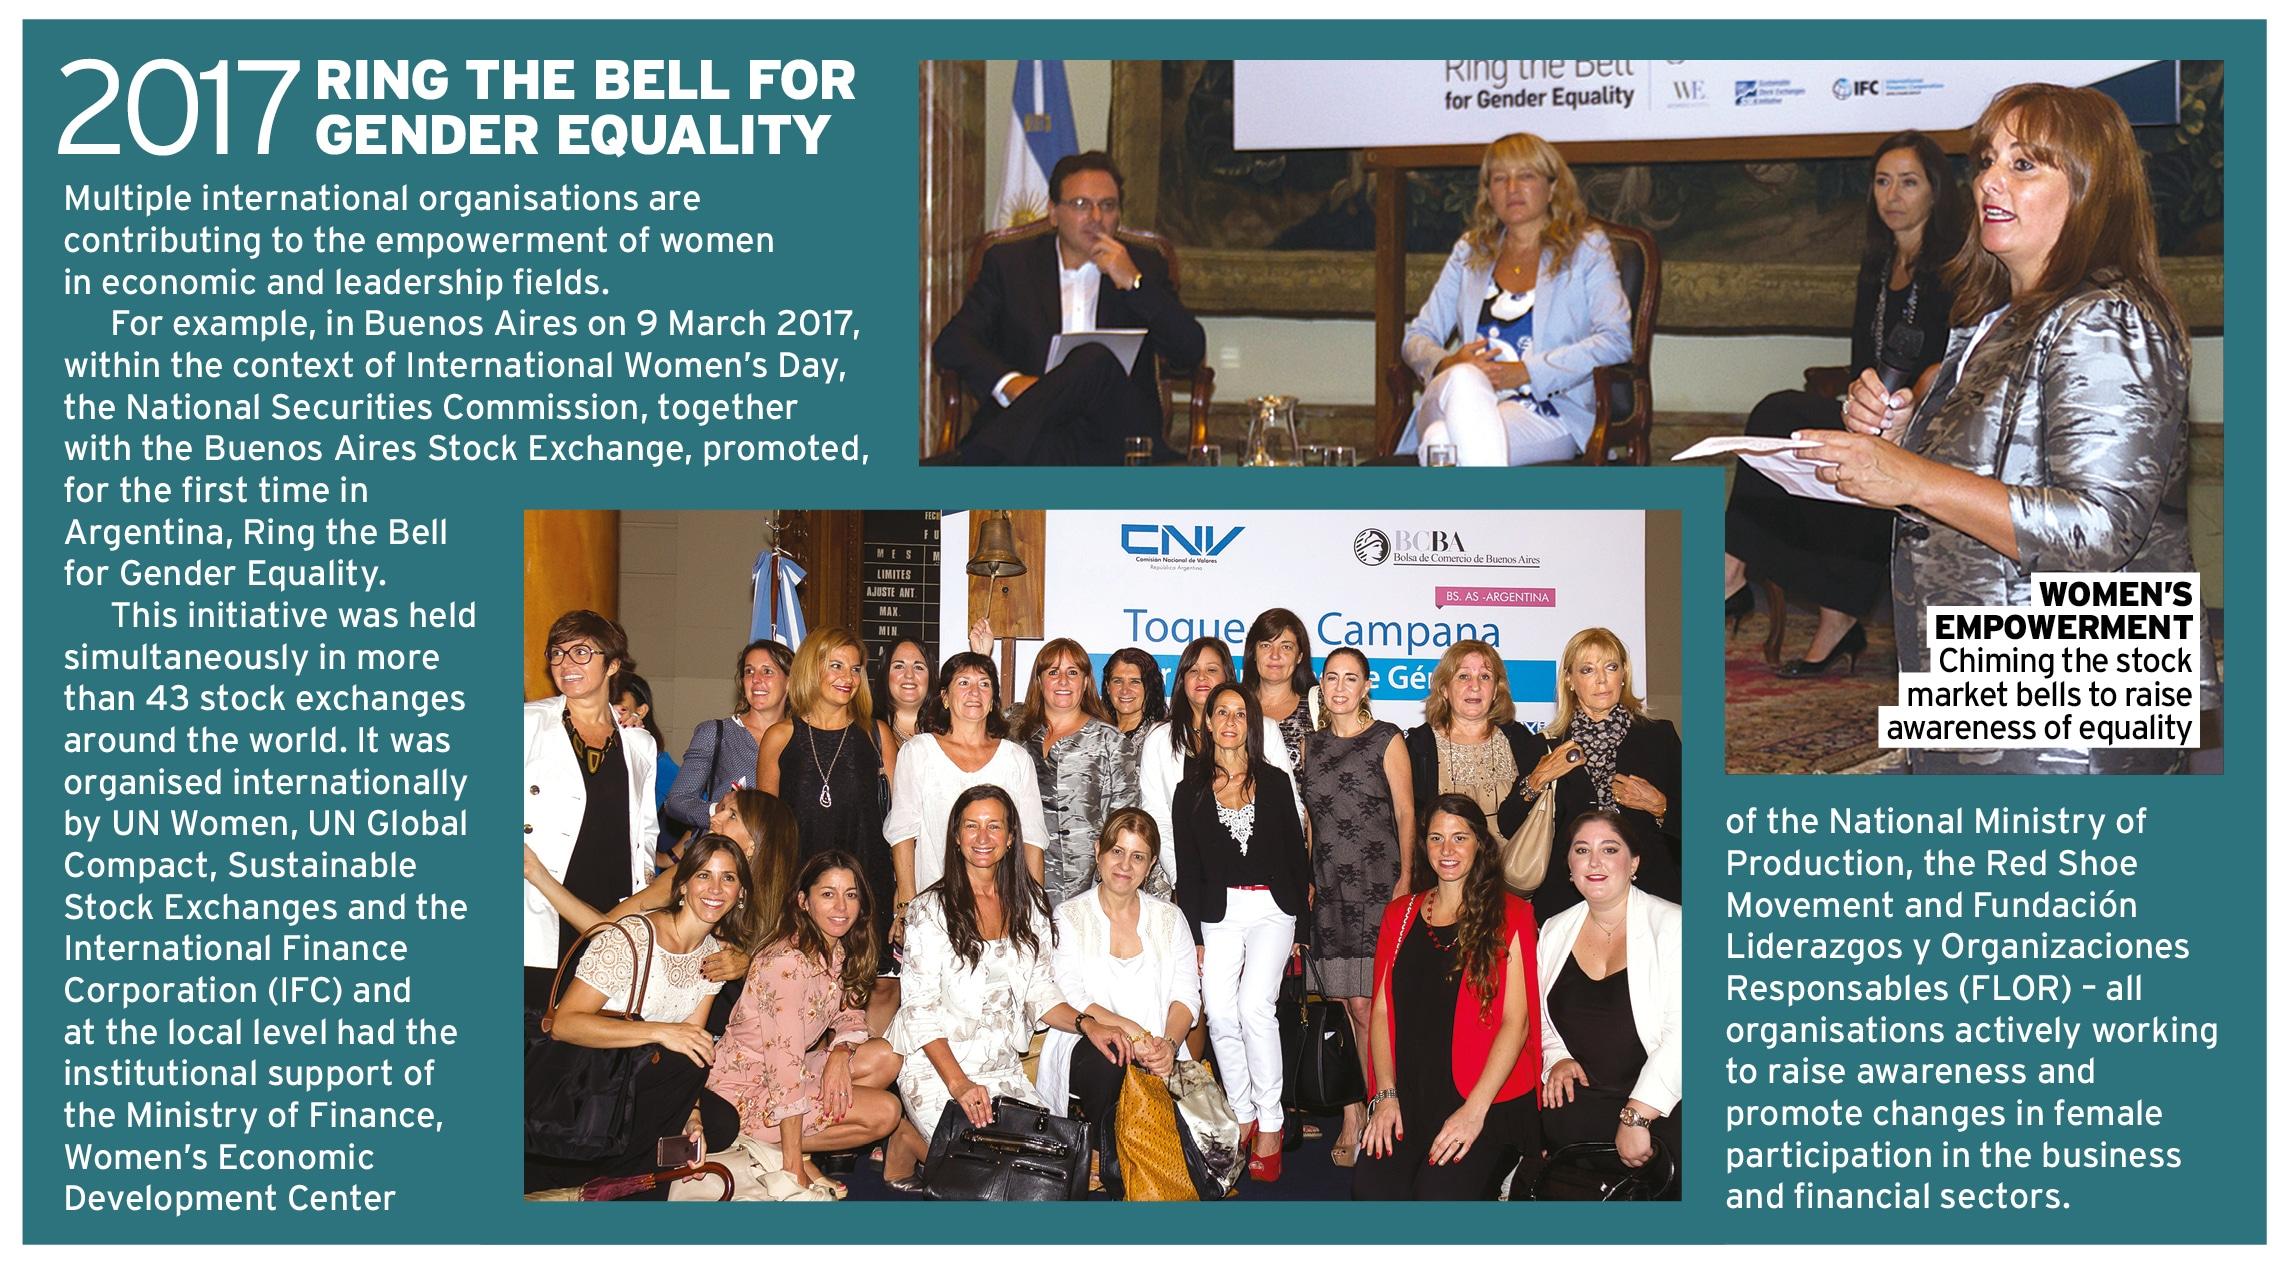 Board gender diversity in Latin America Ethical Boardroom